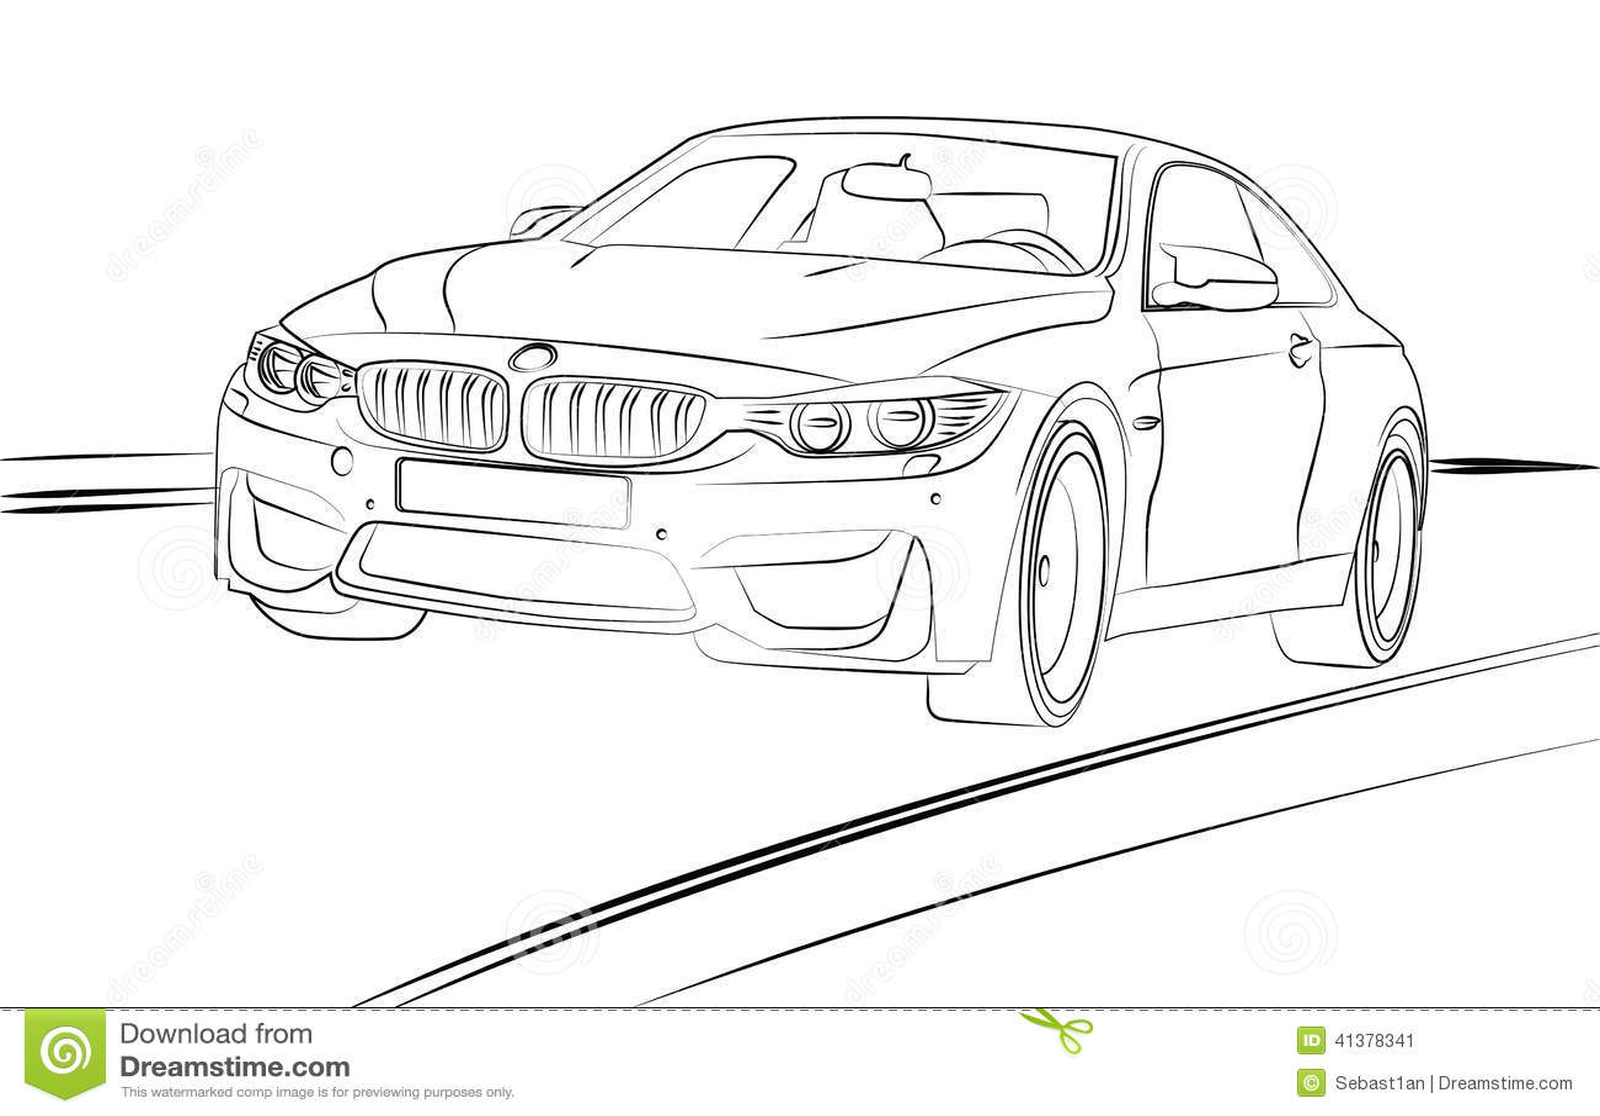 Line Art Car : Car line art royalty free stock image cartoondealer